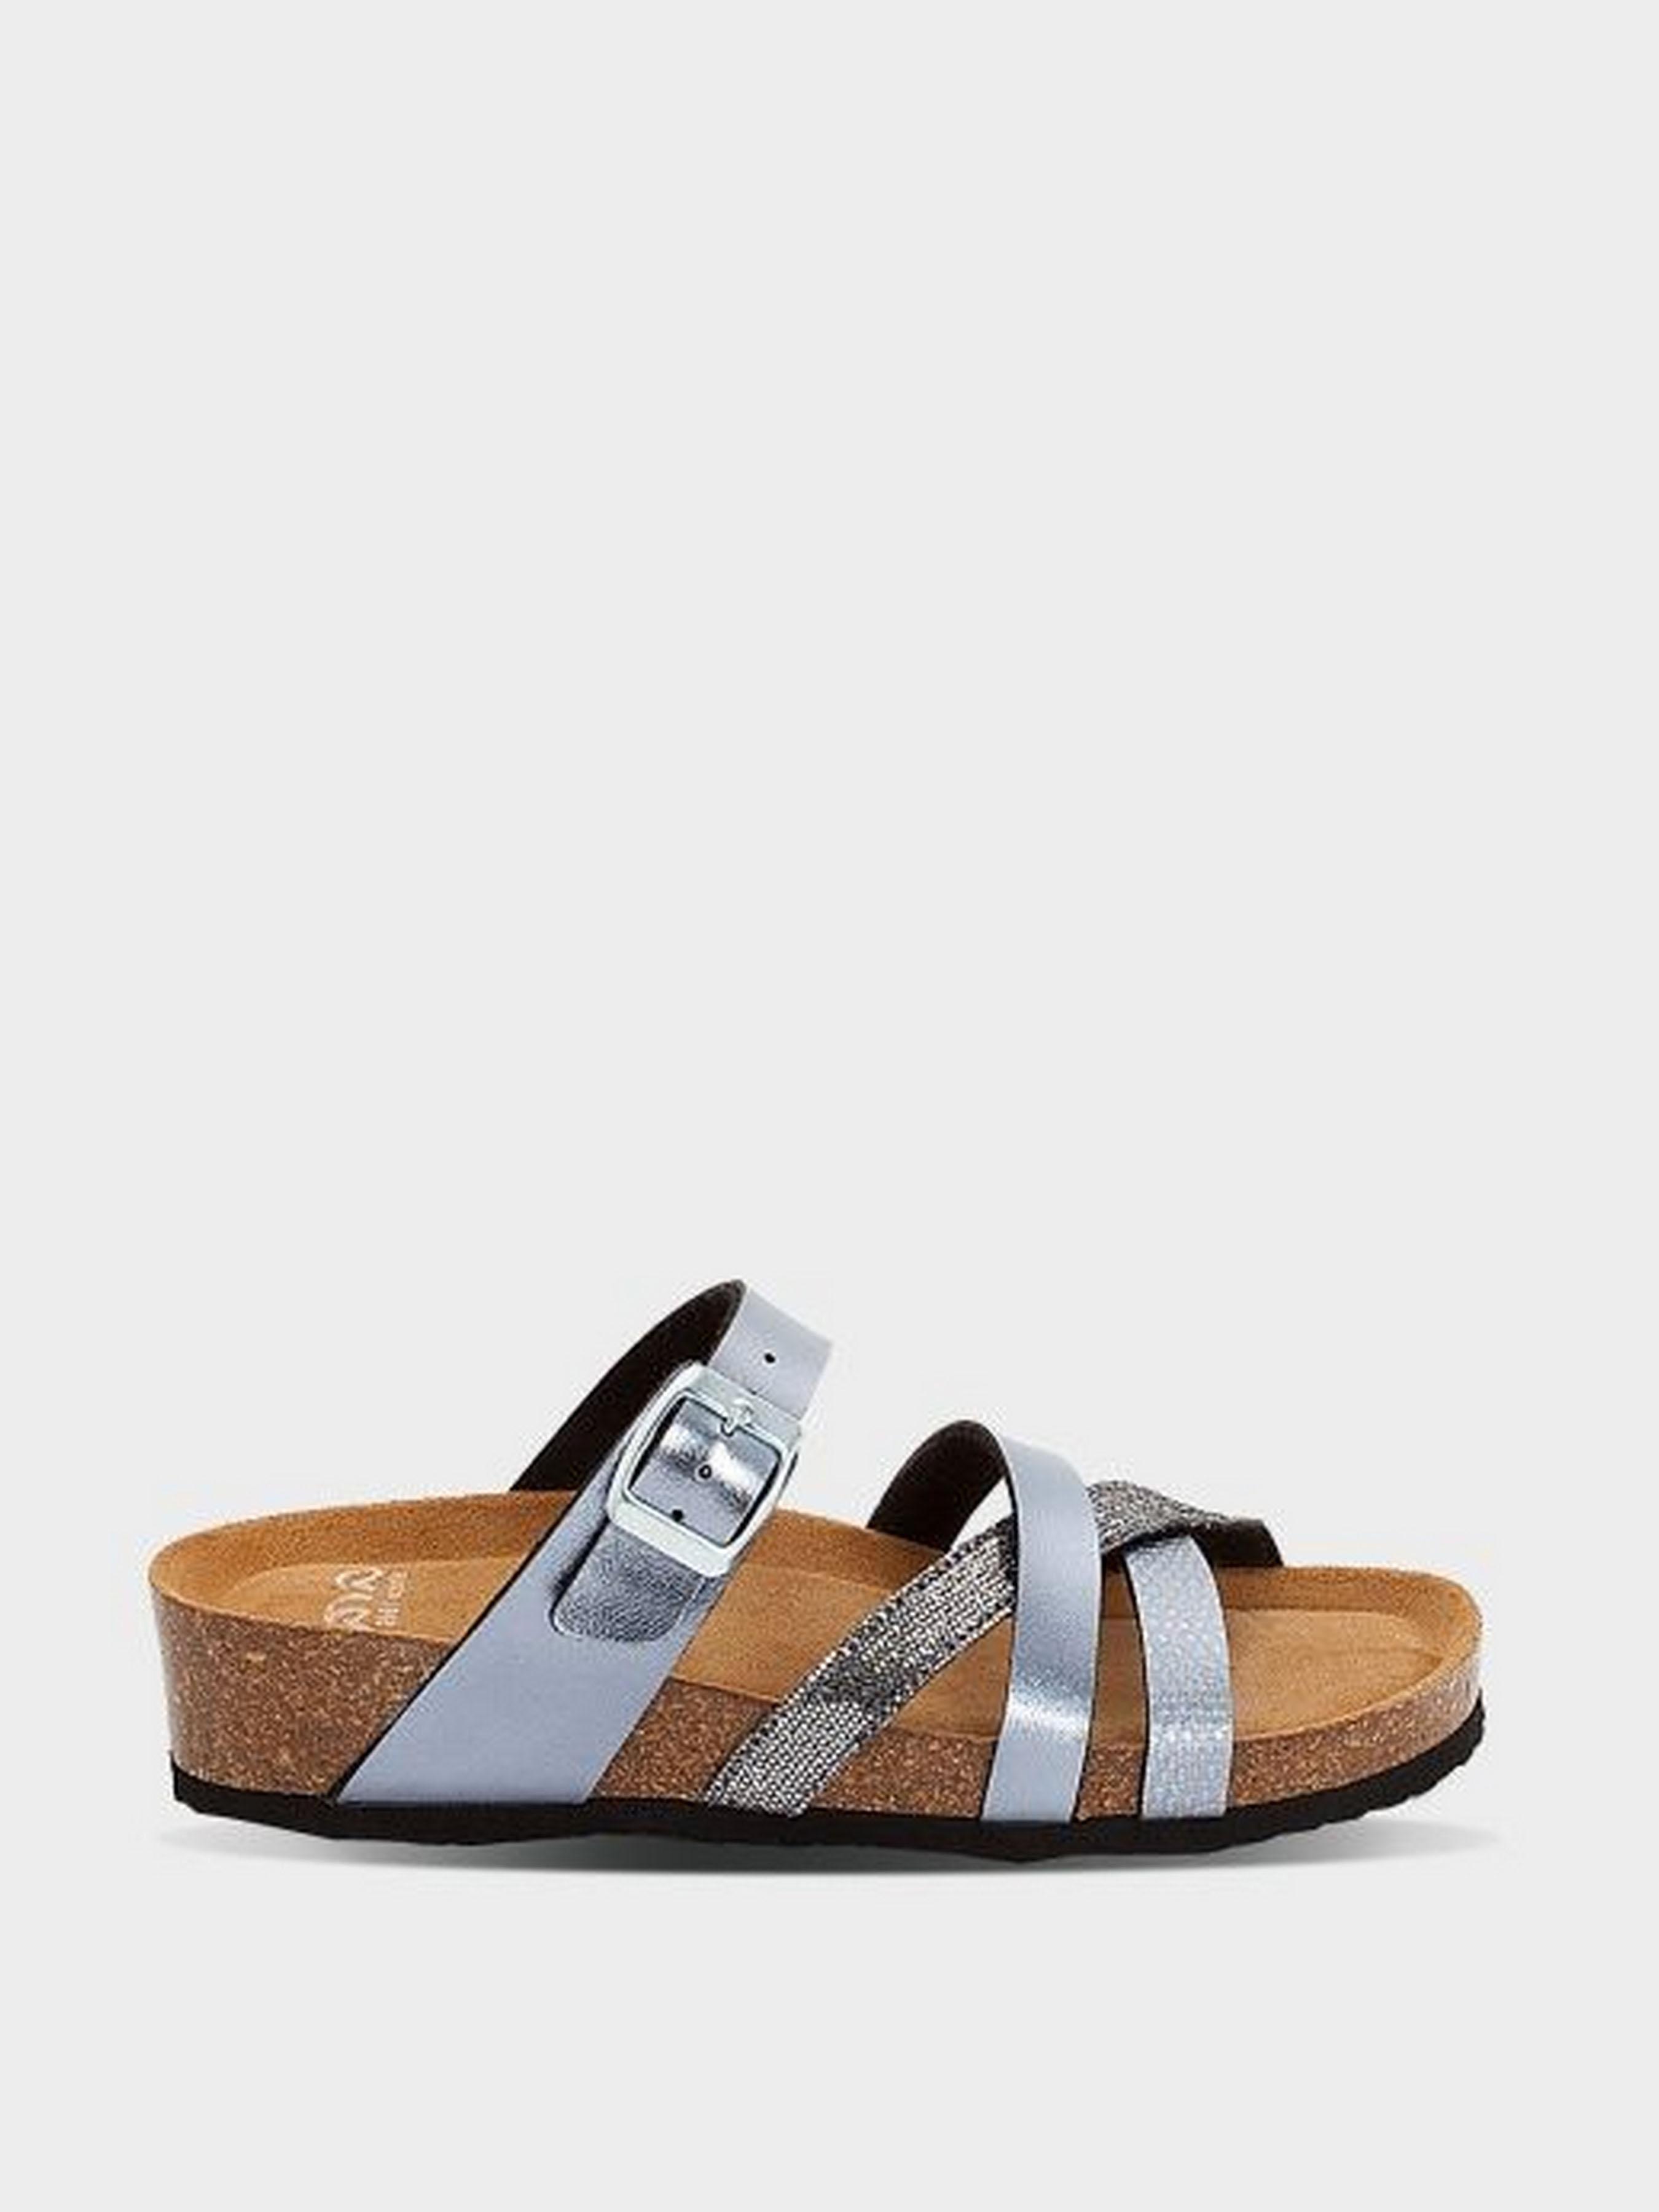 Шлёпанцы для женщин ARA BALI AA1259 размеры обуви, 2017